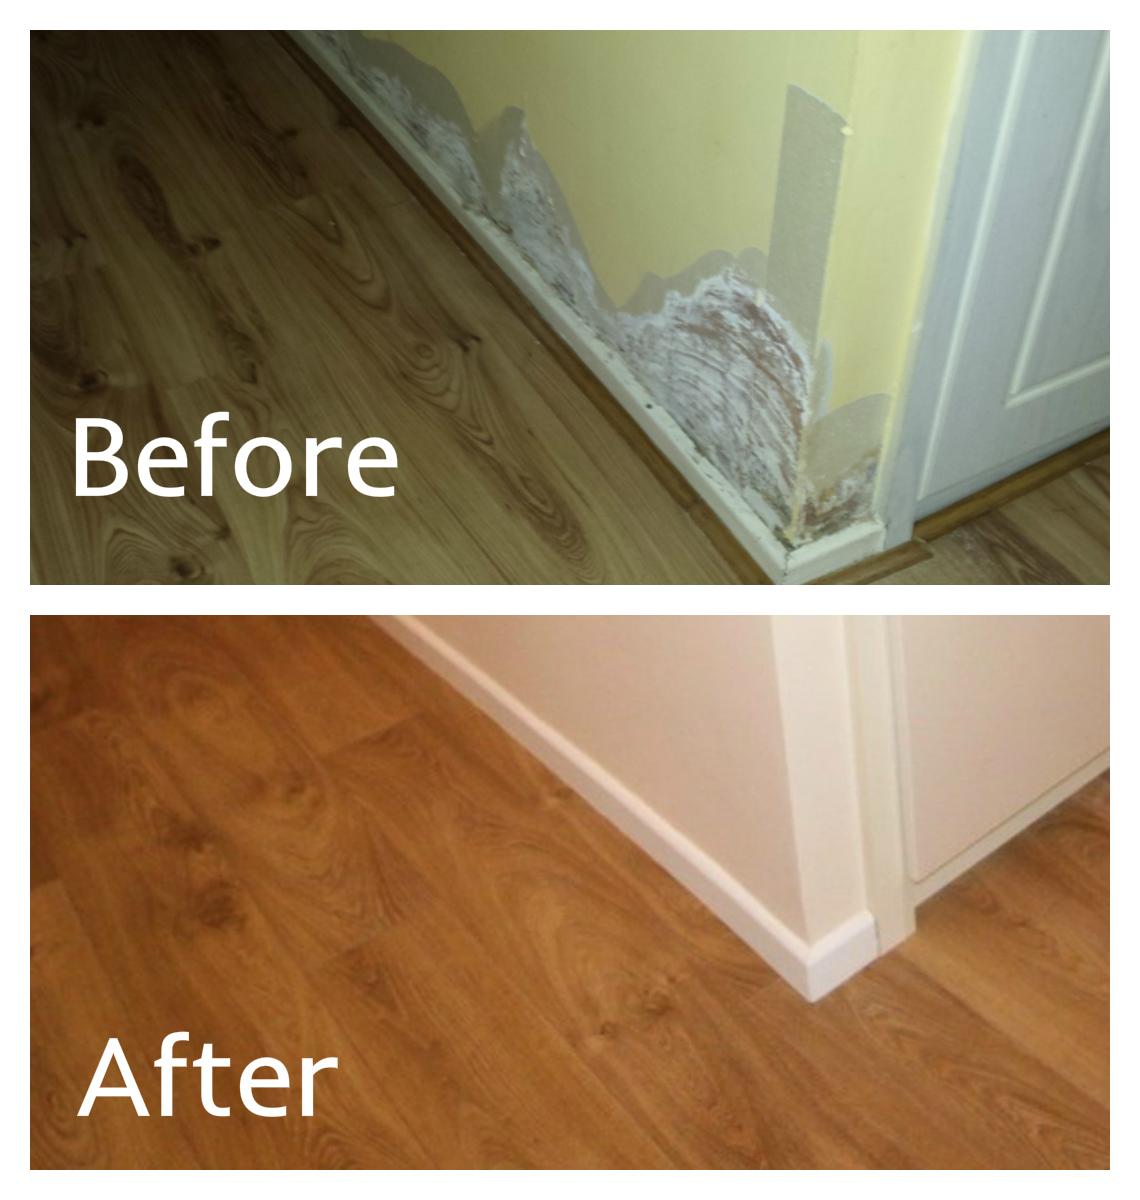 repairing plaster walls after water damage